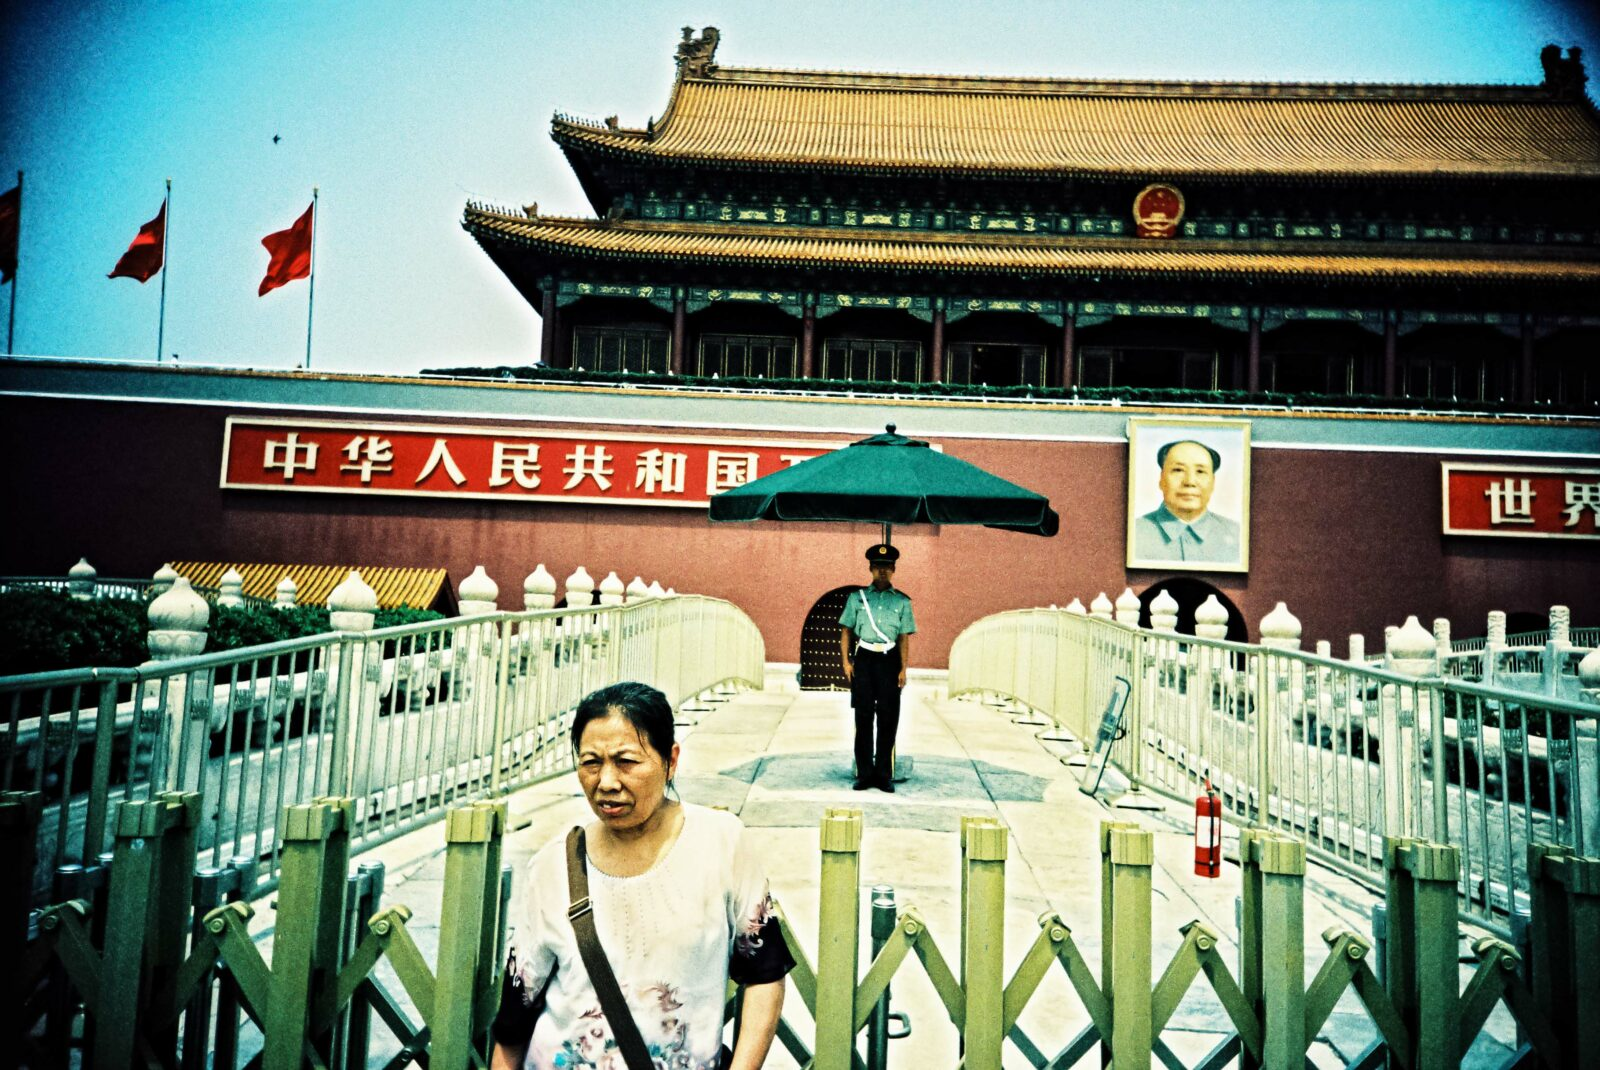 instaCDV 15 China roll11 Beijing ForbiddenCity 000017